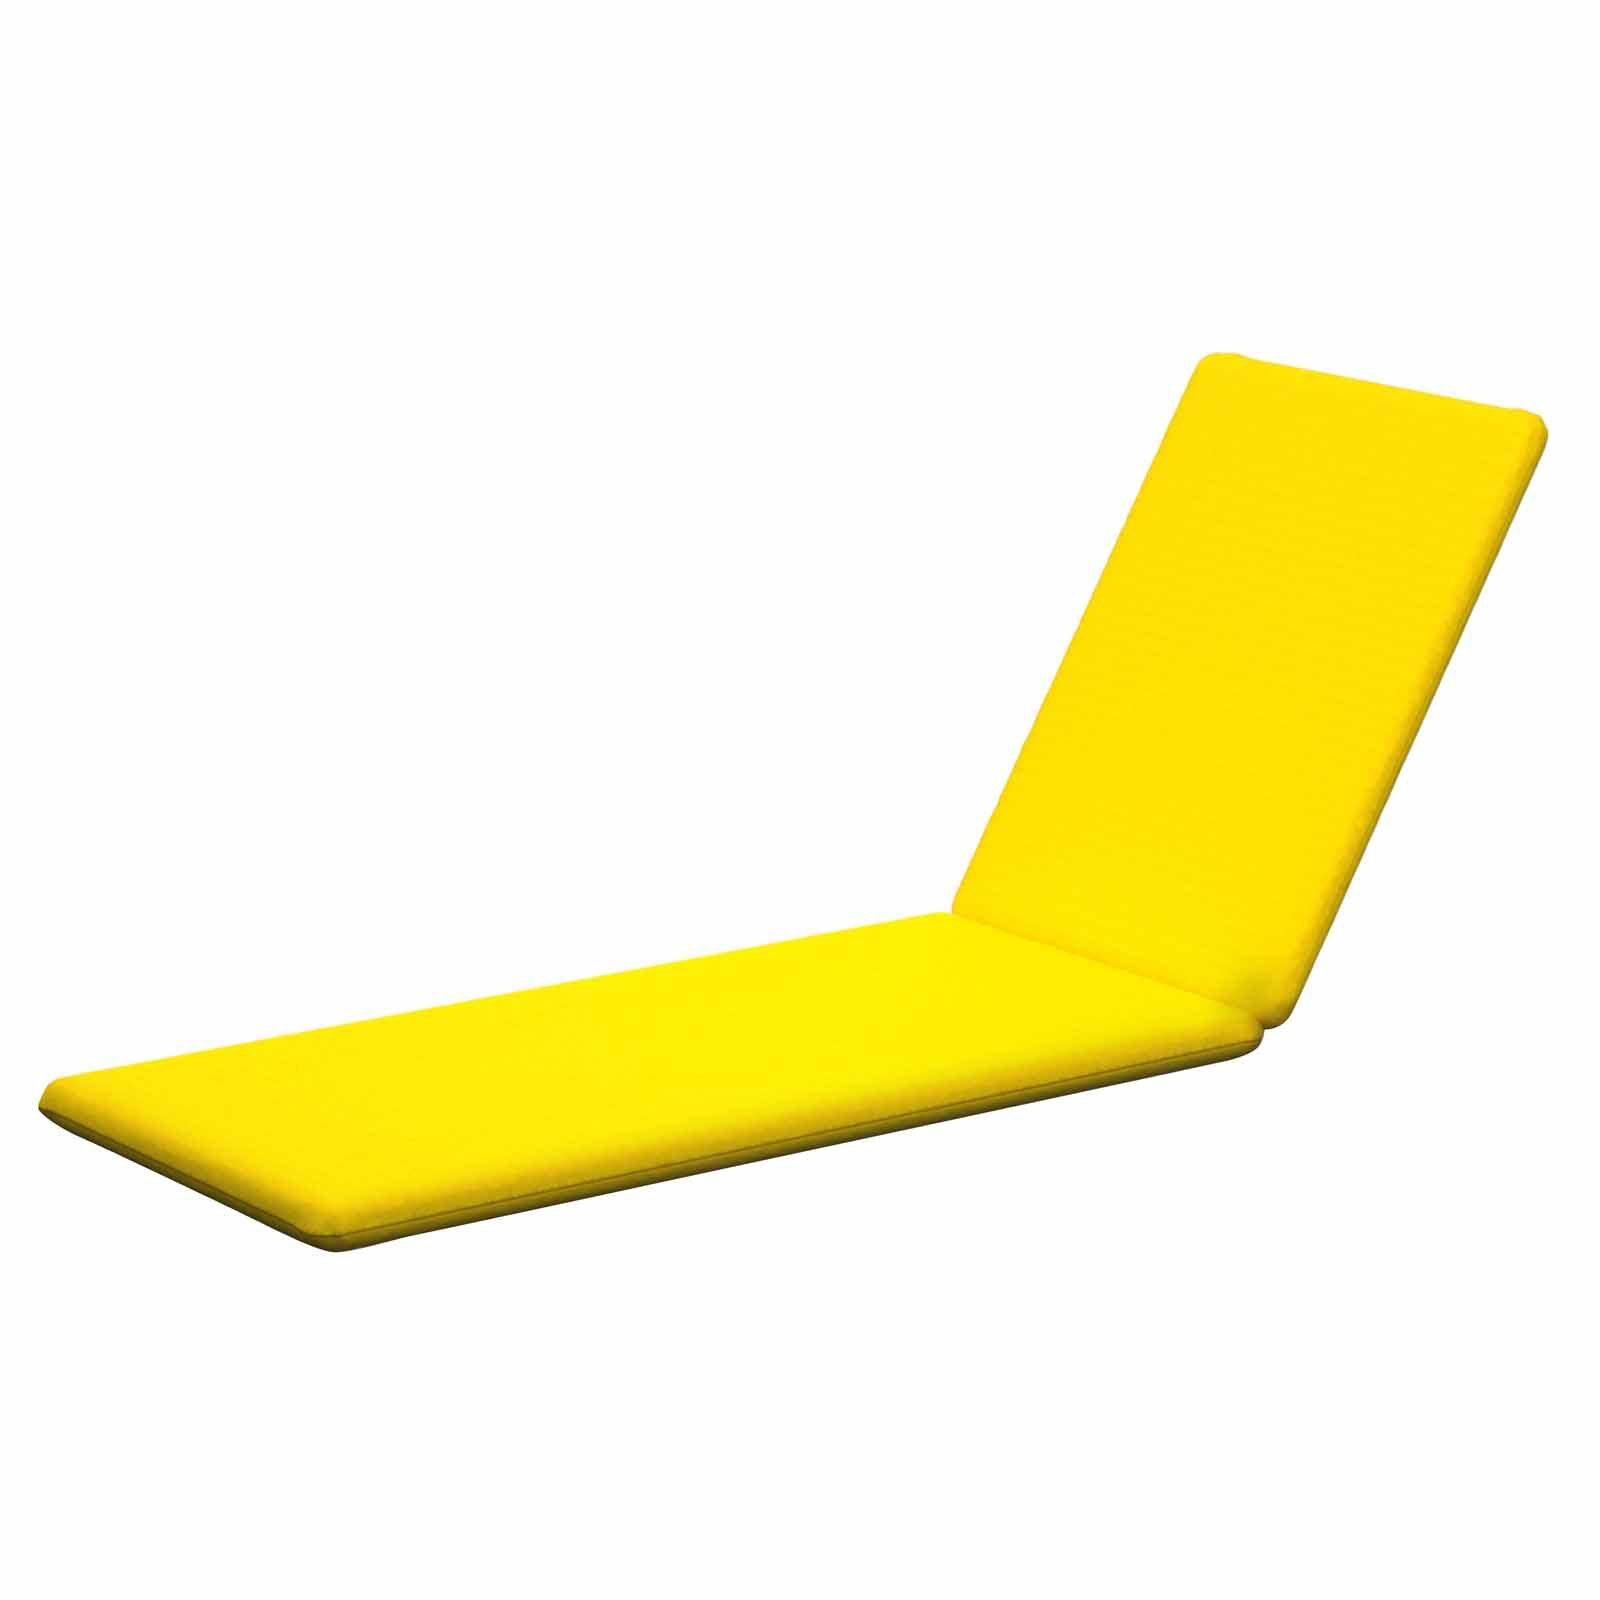 POLYWOOD® Sunbrella 75.25 x 25.25 in. Chaise Lounge Cushion